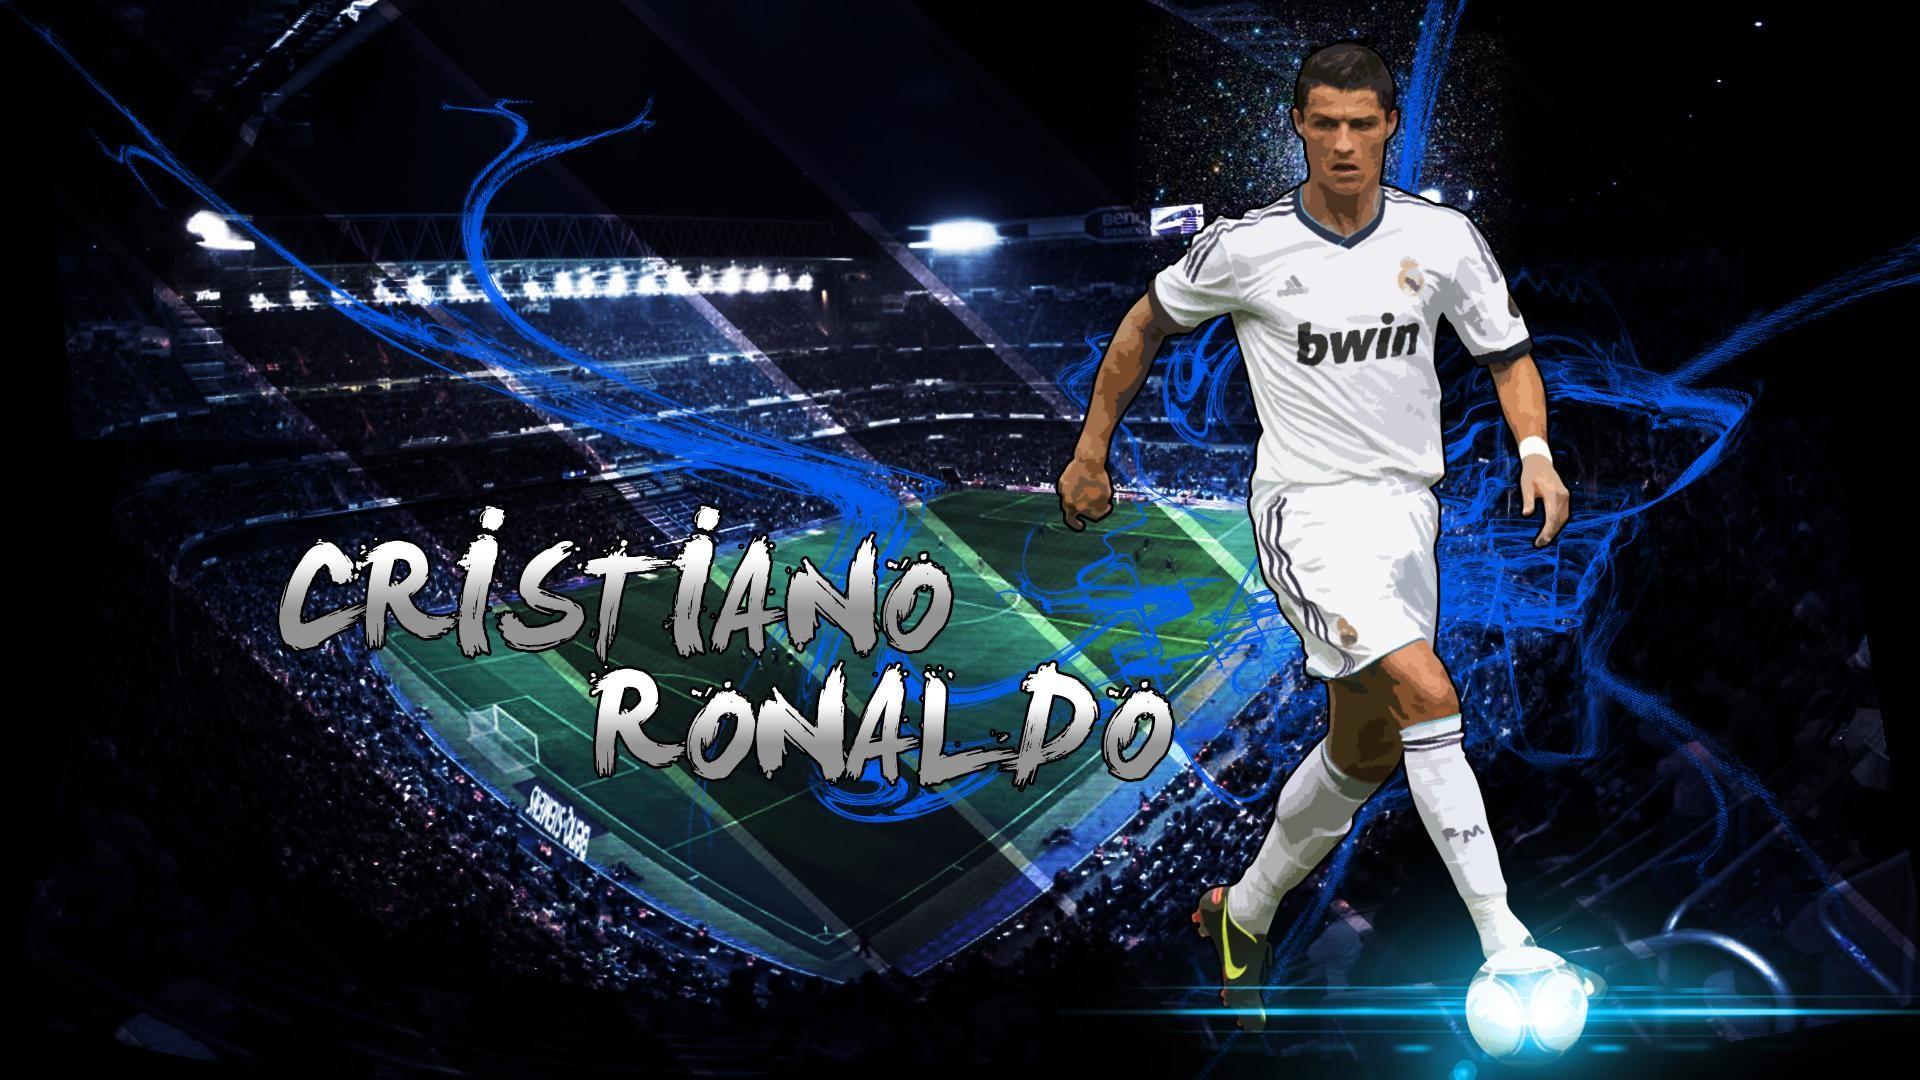 Cristiano Ronaldo Wallpapers 2015 Nike – Wallpaper Cave